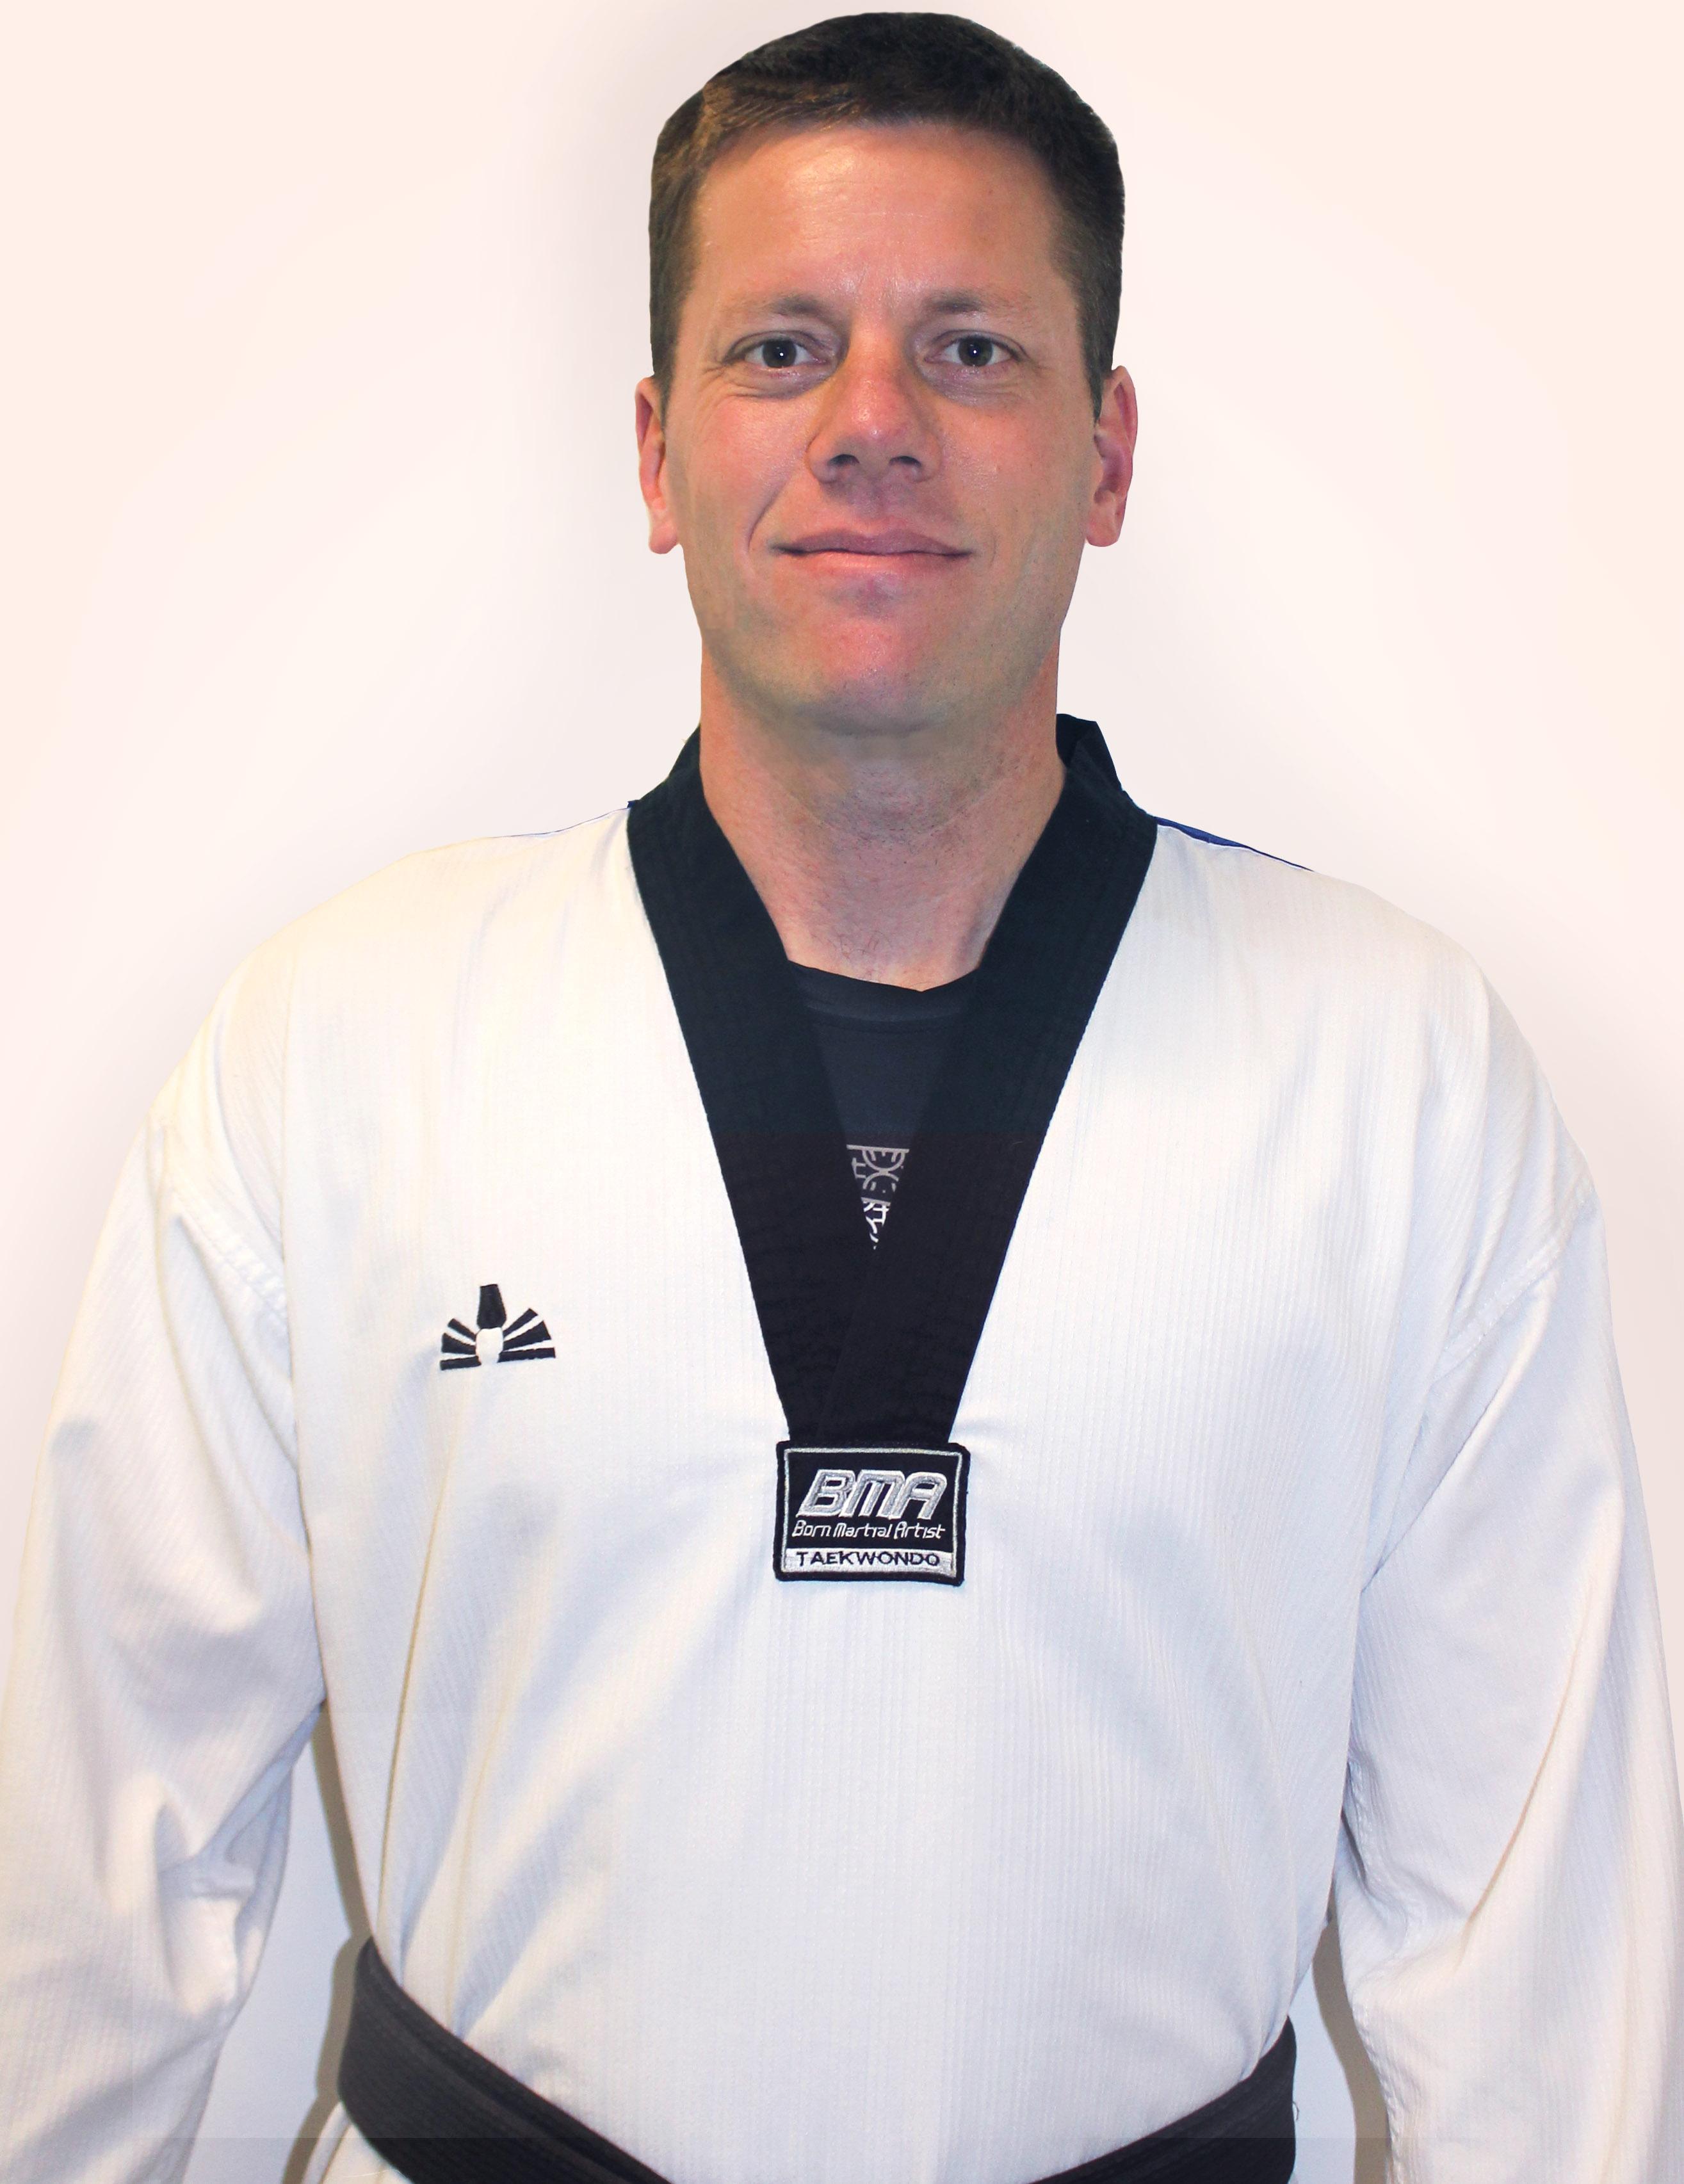 Instructor Ken